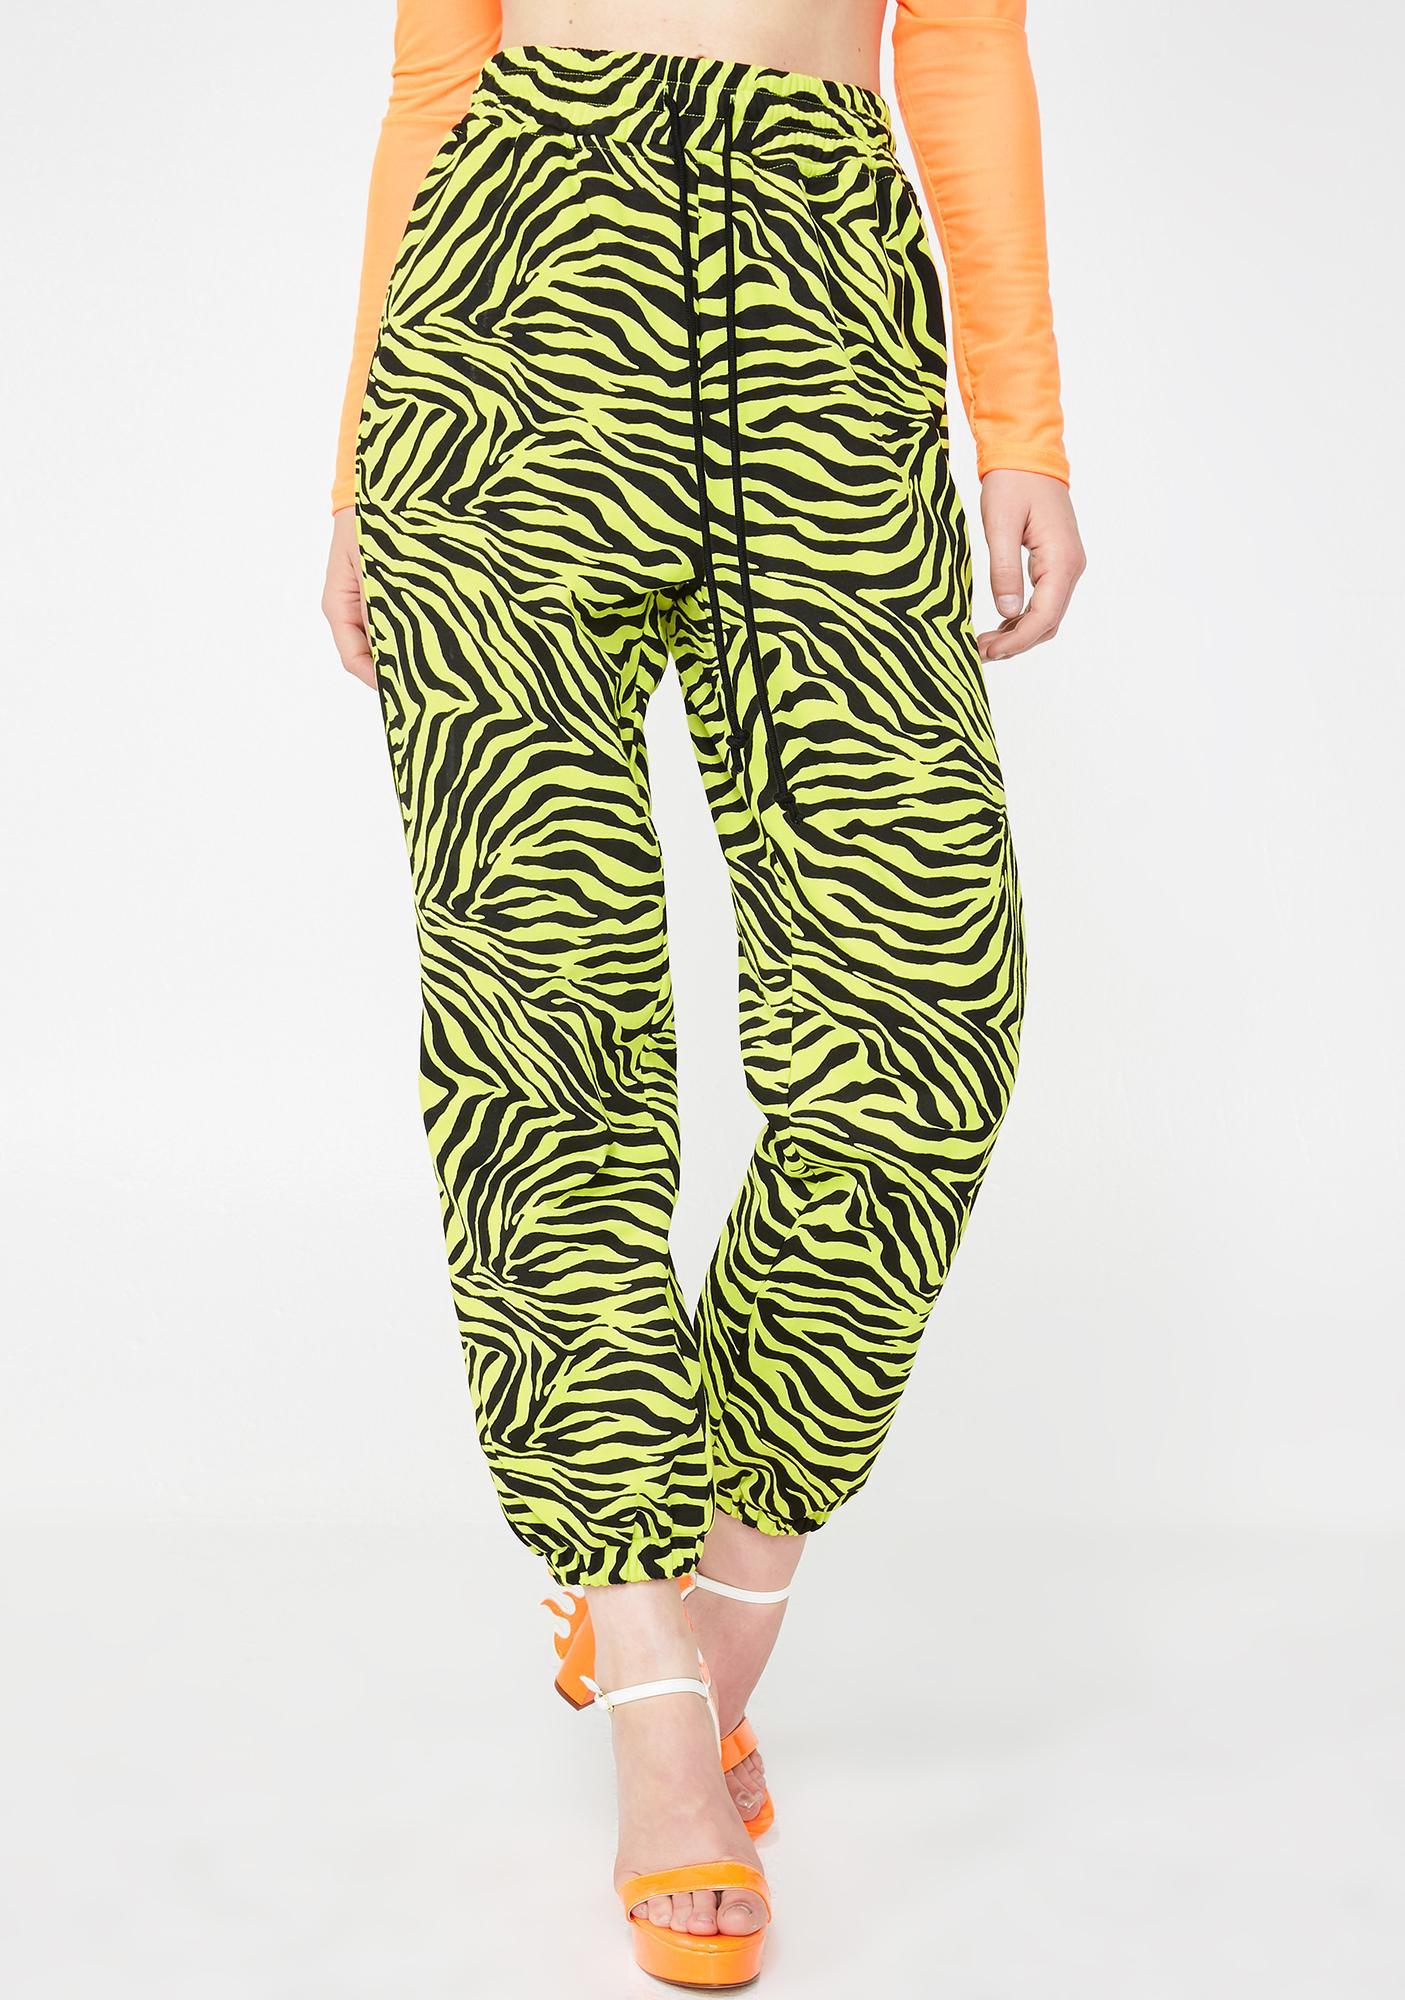 Radioactive Jungle Zebra Pants